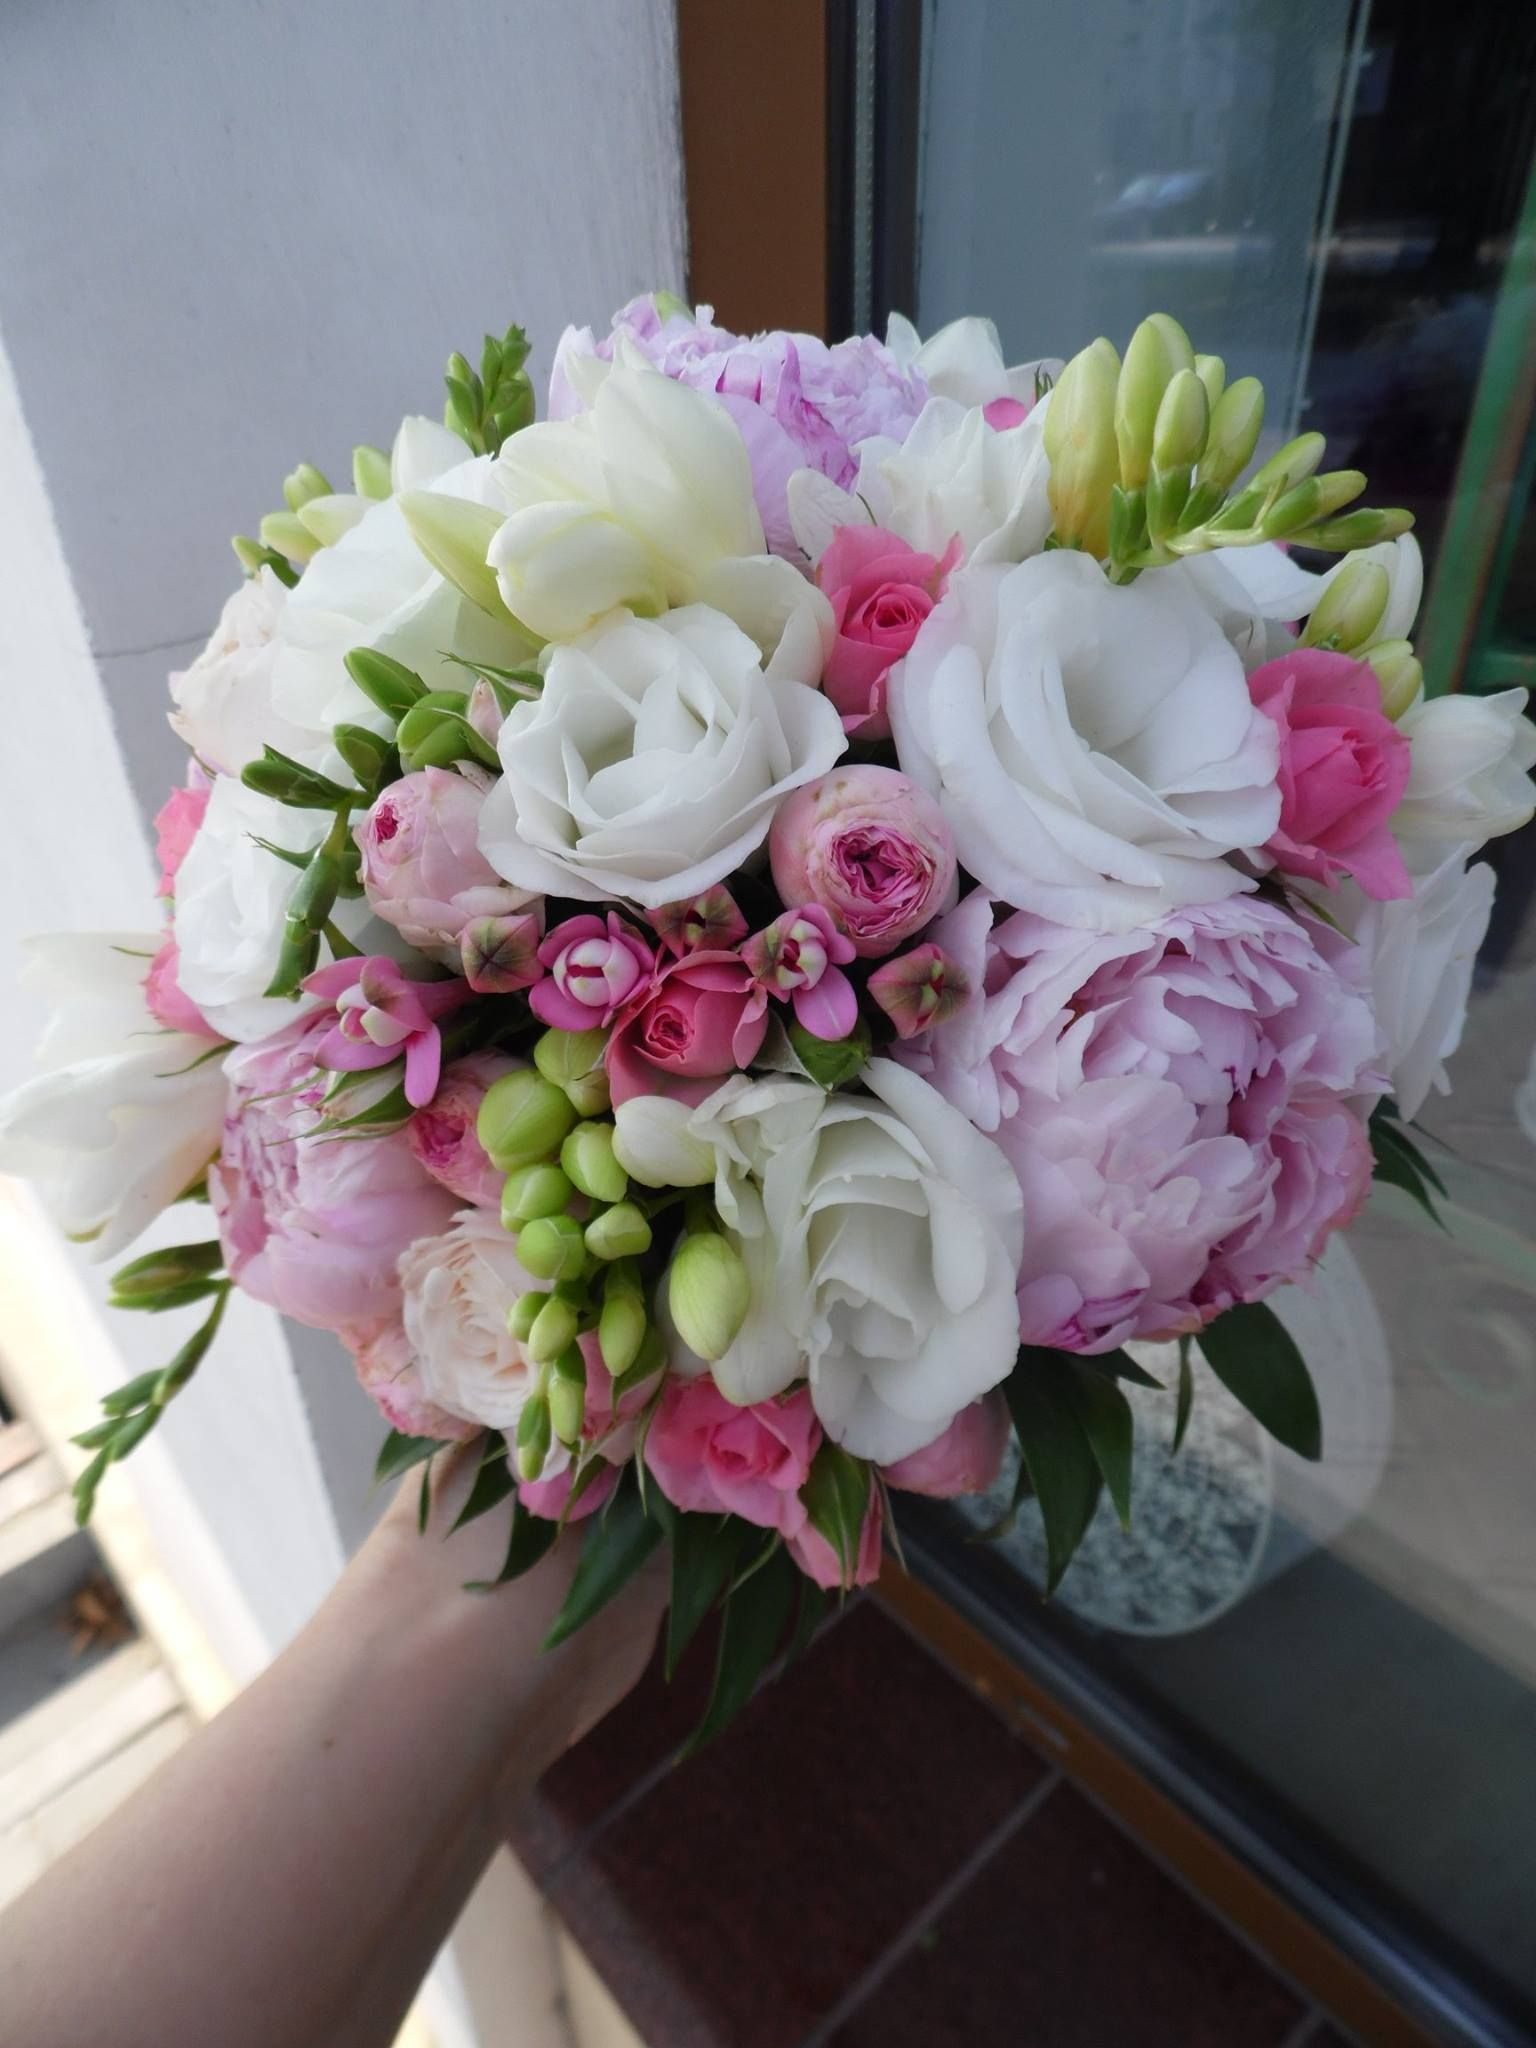 Pin by karola on wedding flower2 pinterest wedding bouquets small wedding bouquets flower bouquet wedding flower bouquets bridal bouquets country wedding izmirmasajfo